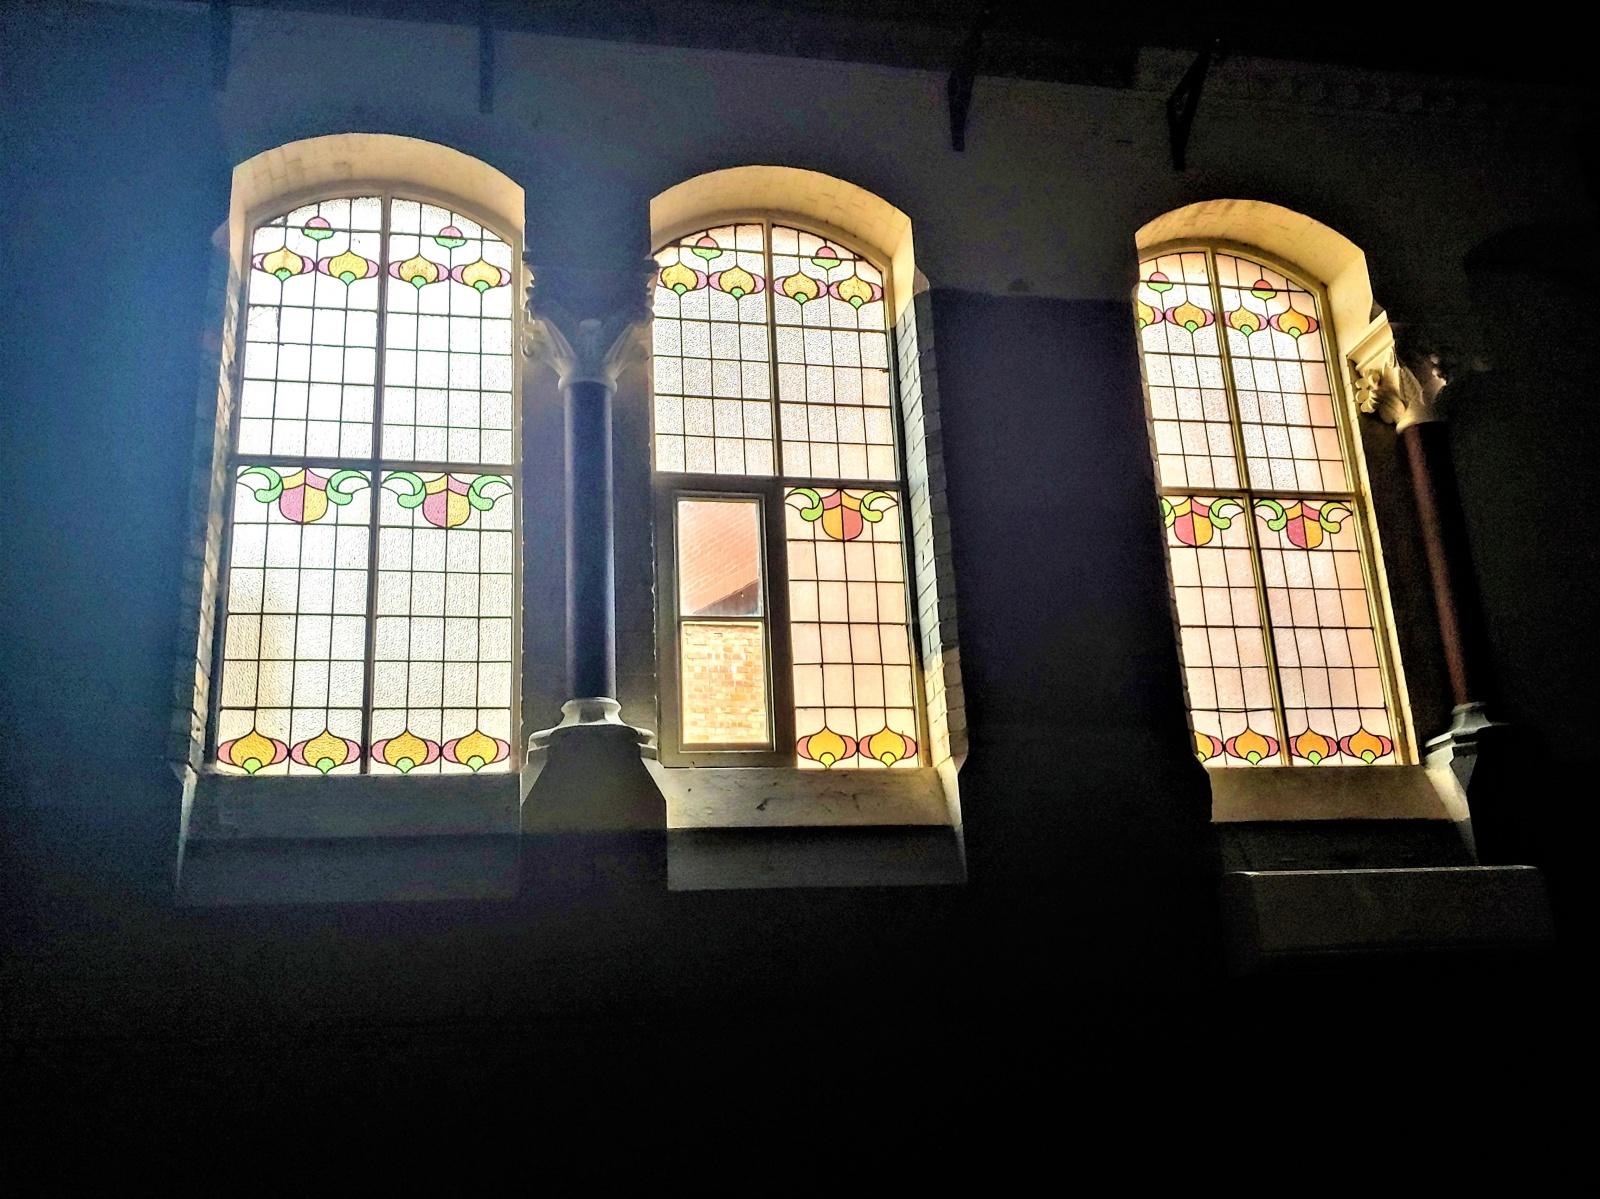 Wightman Hall, Princess Street, Shrewsbury, Shropshire